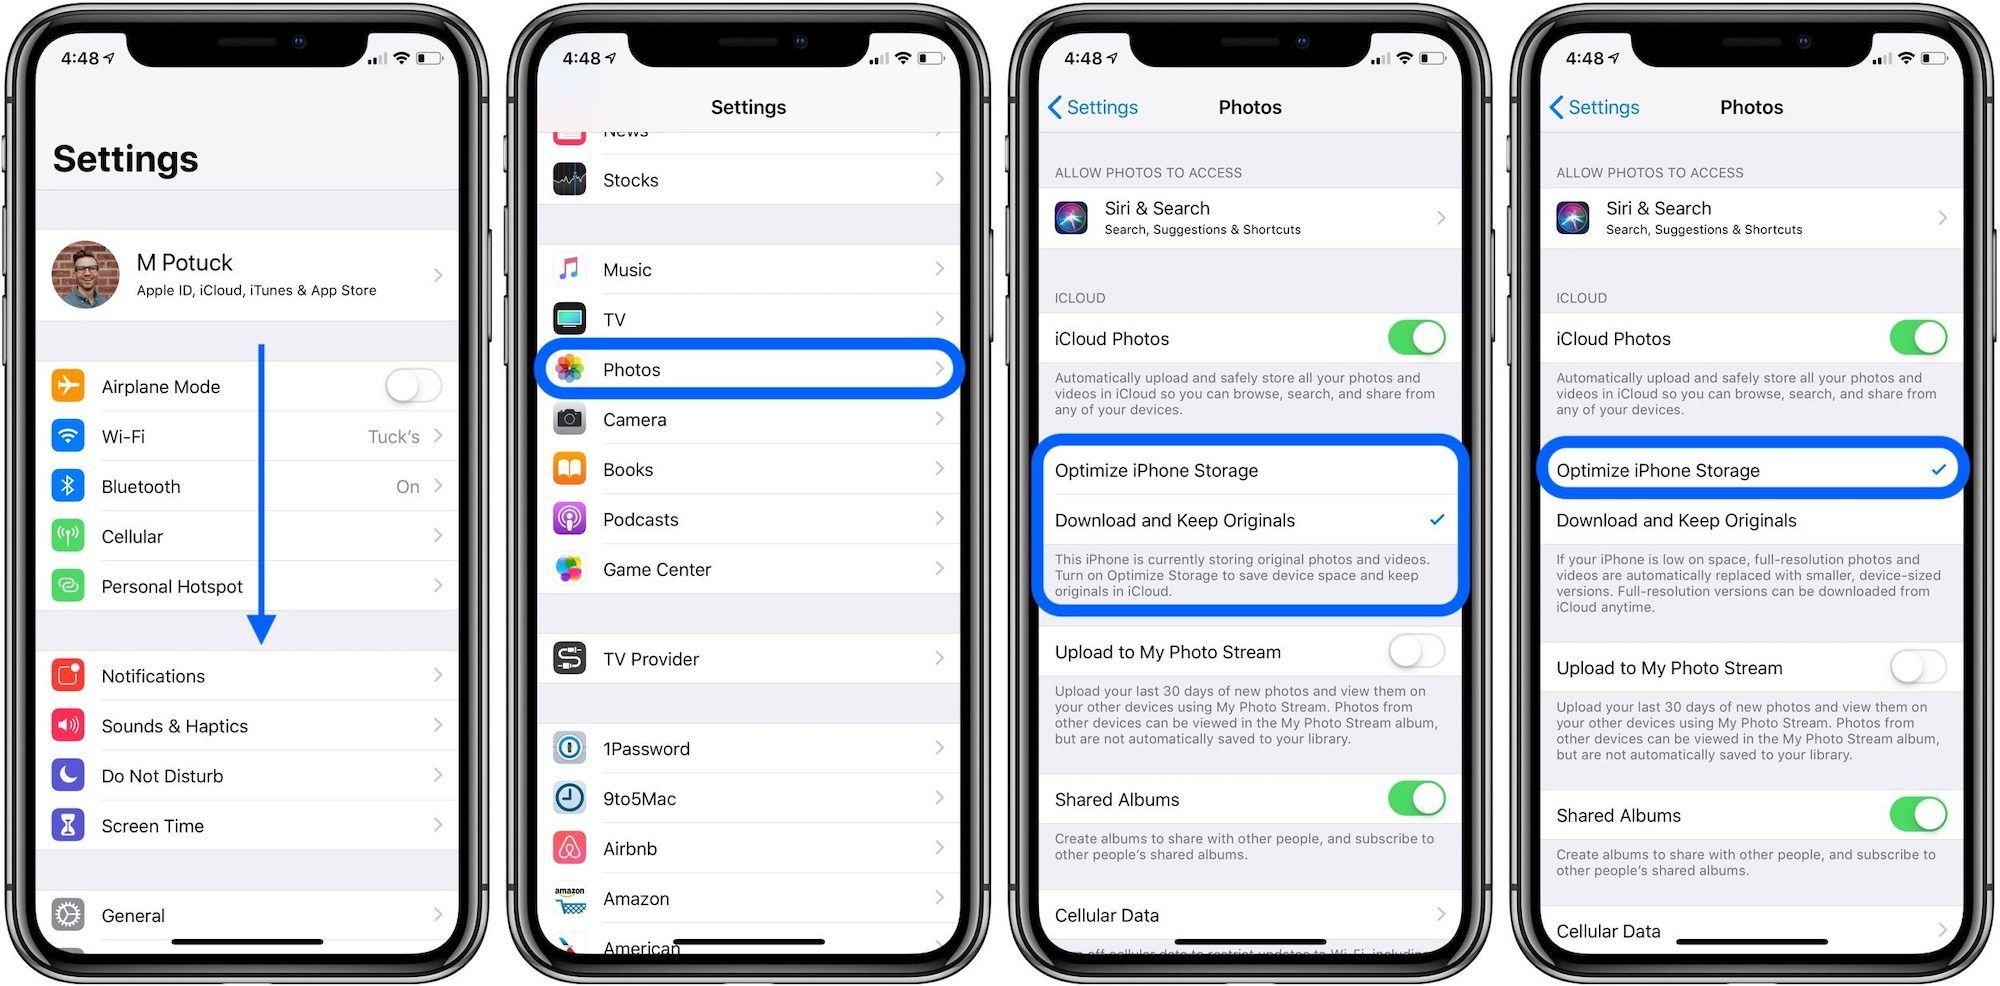 e80803881a5cc091efbbdfd36f56893b - How To Get Rid Of Other On My Iphone Storage